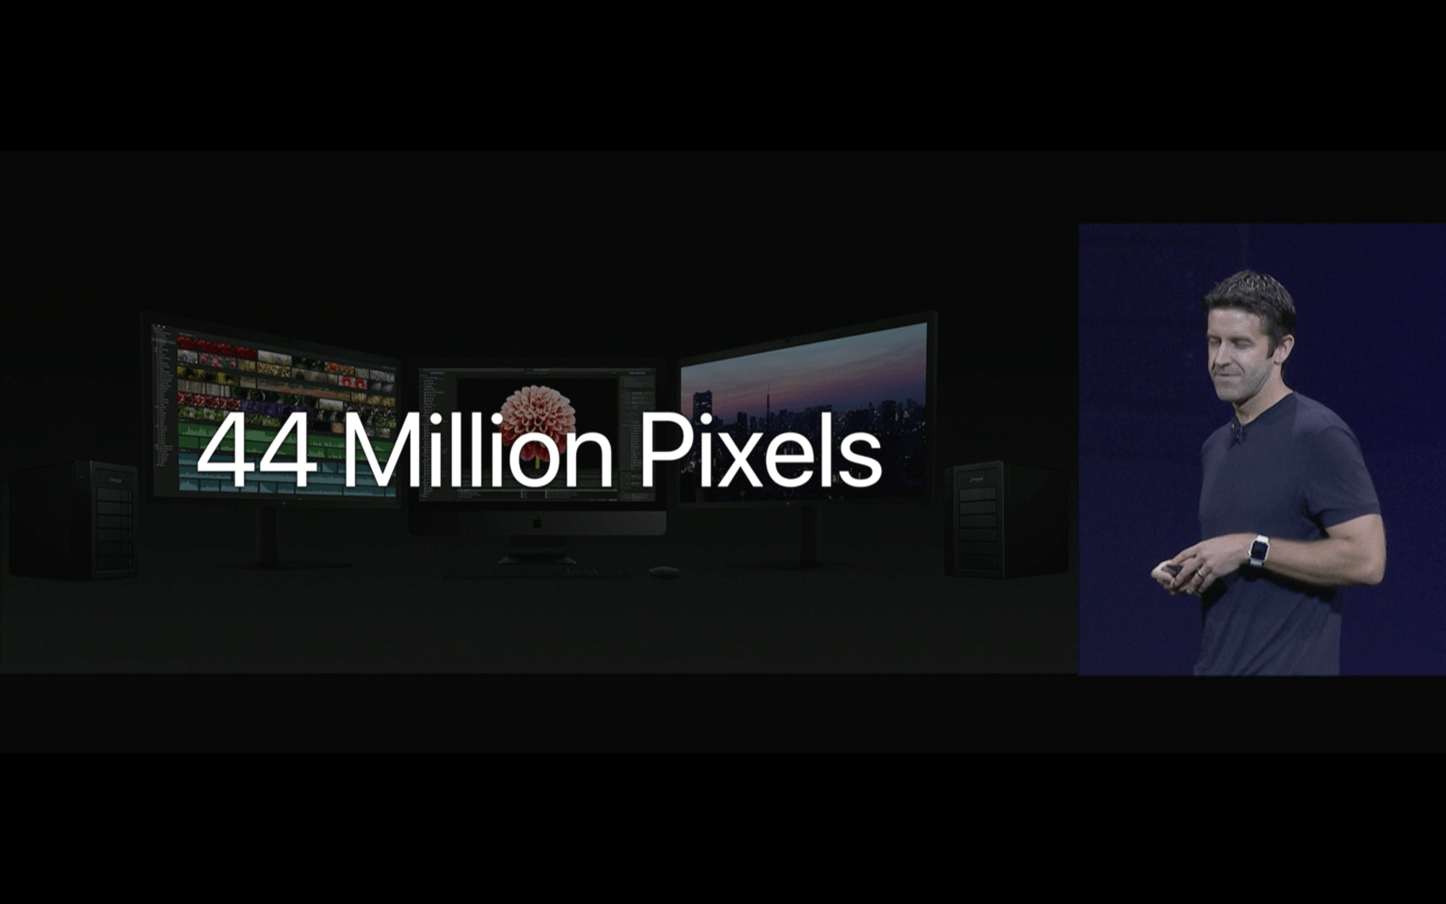 iMac-Pro-2017-WWDC17-23.png